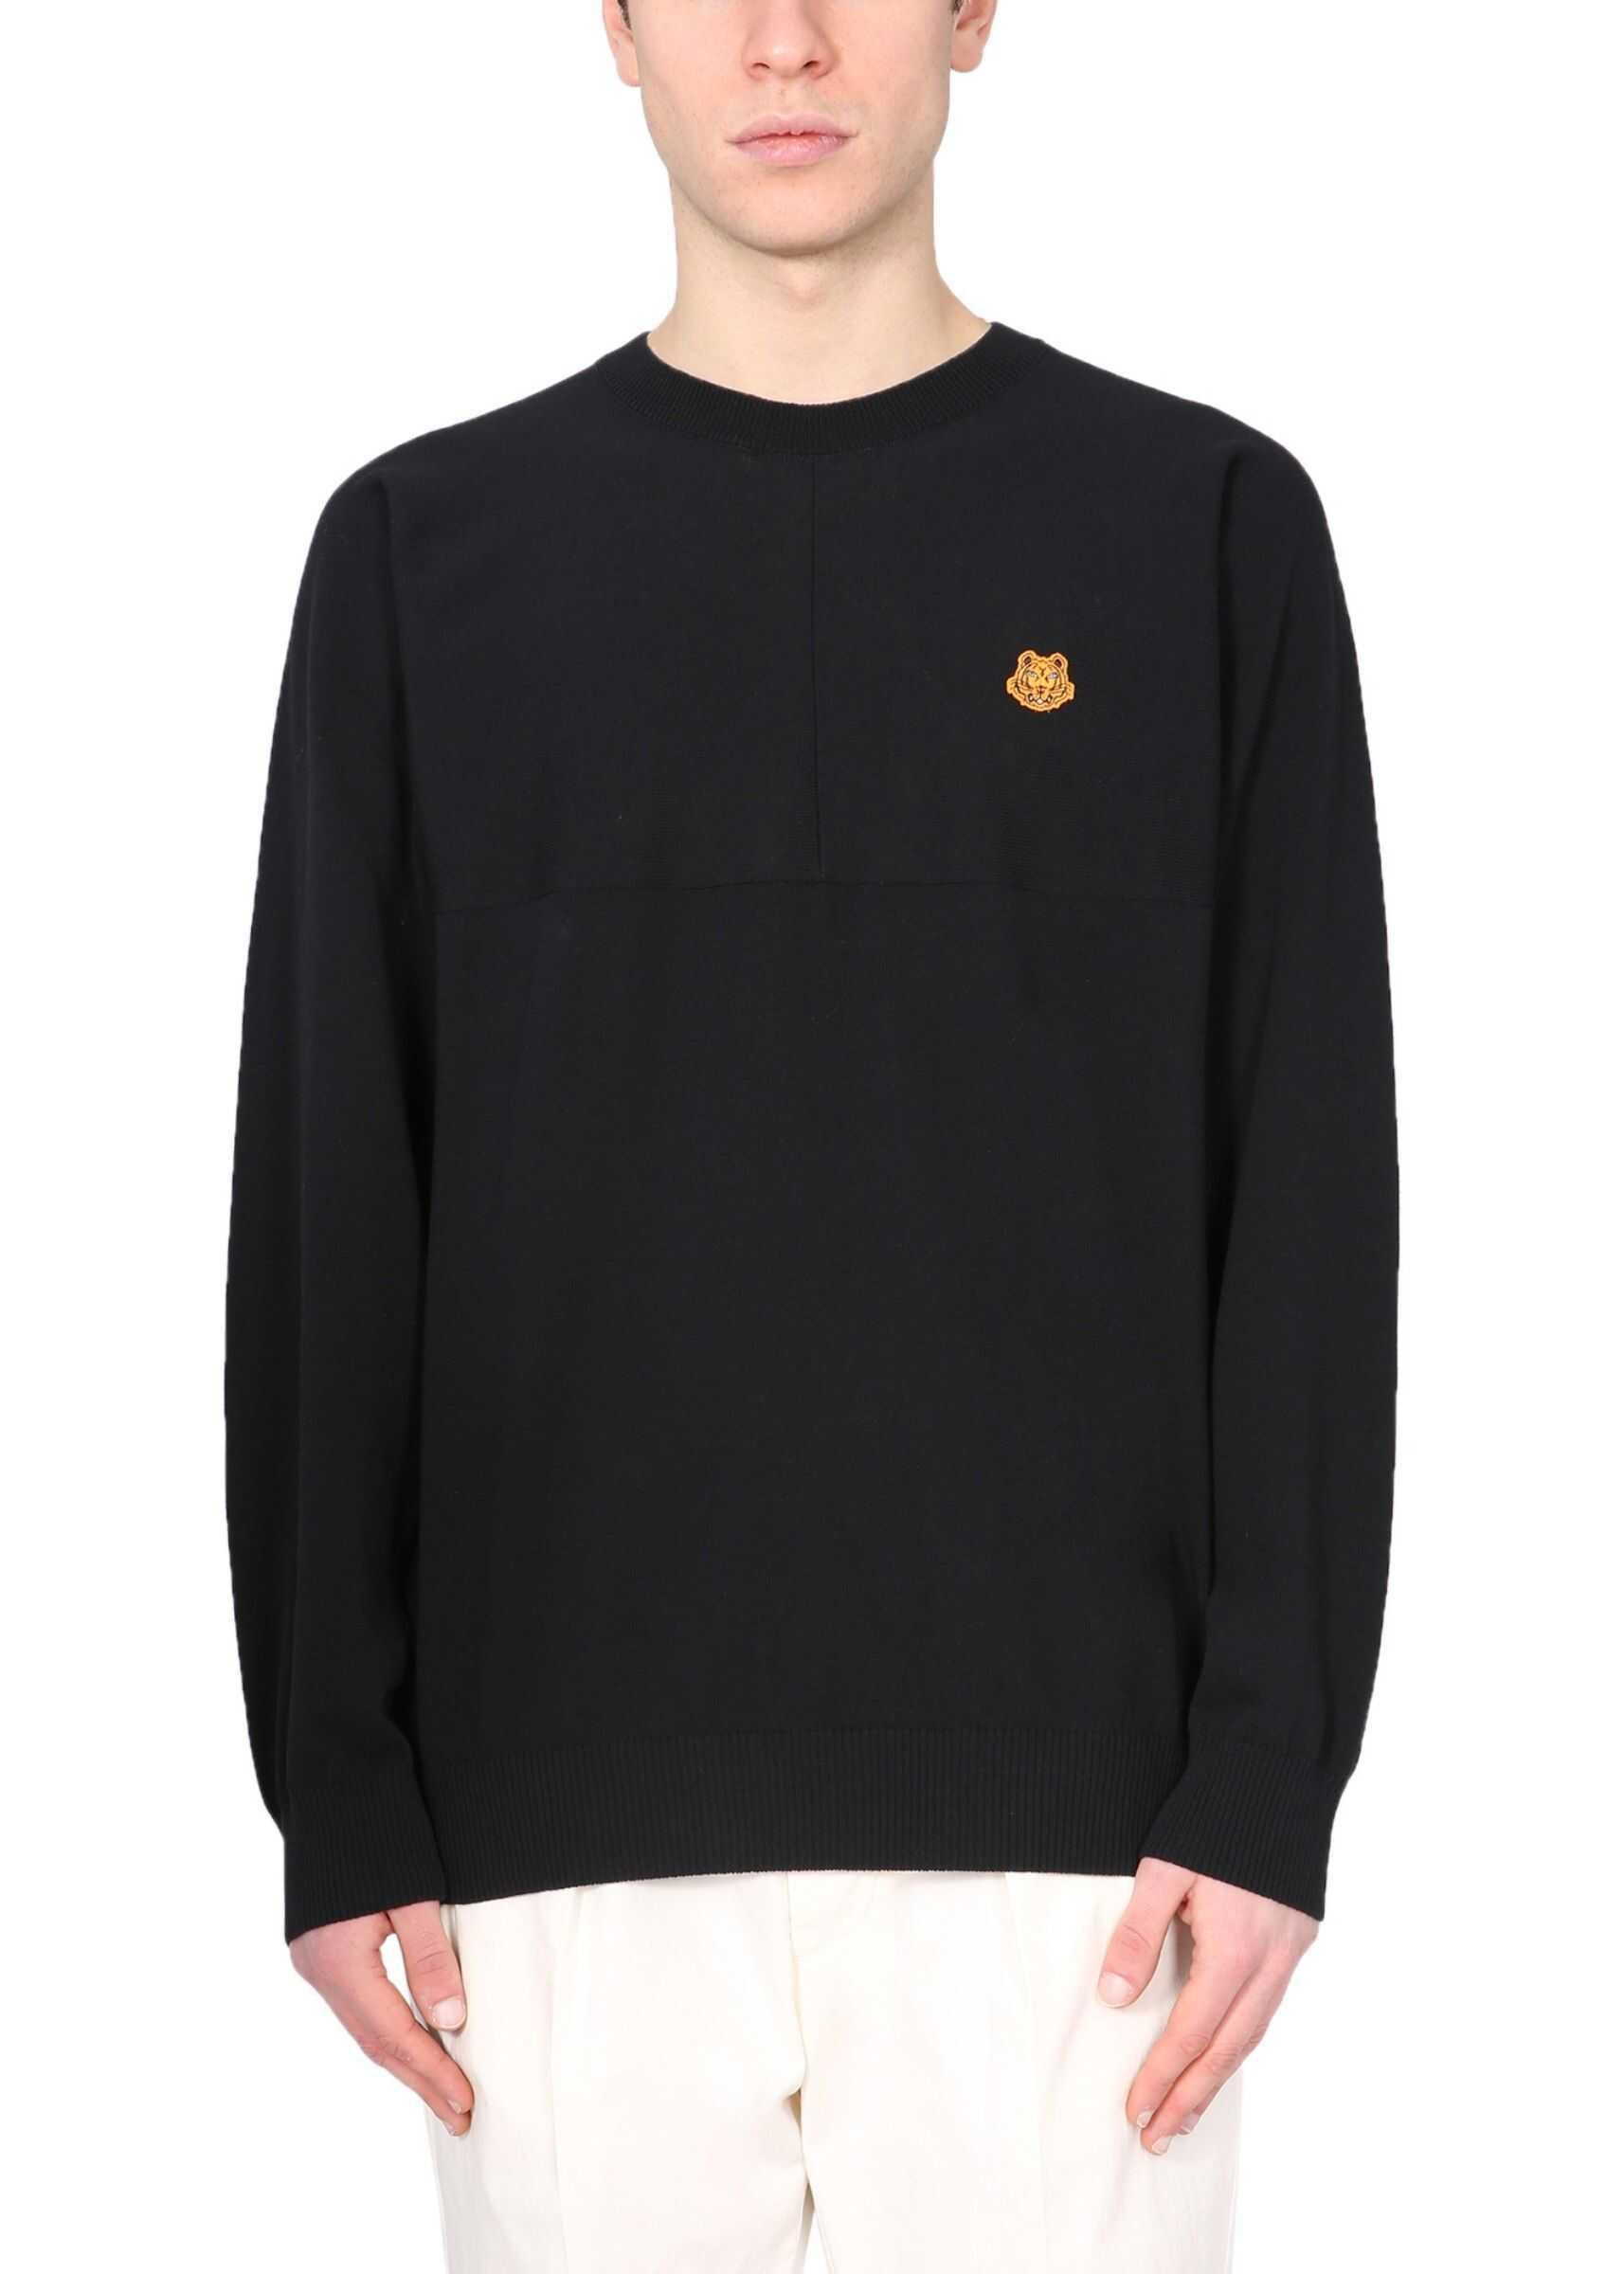 Kenzo Crew Neck Sweater BLACK imagine